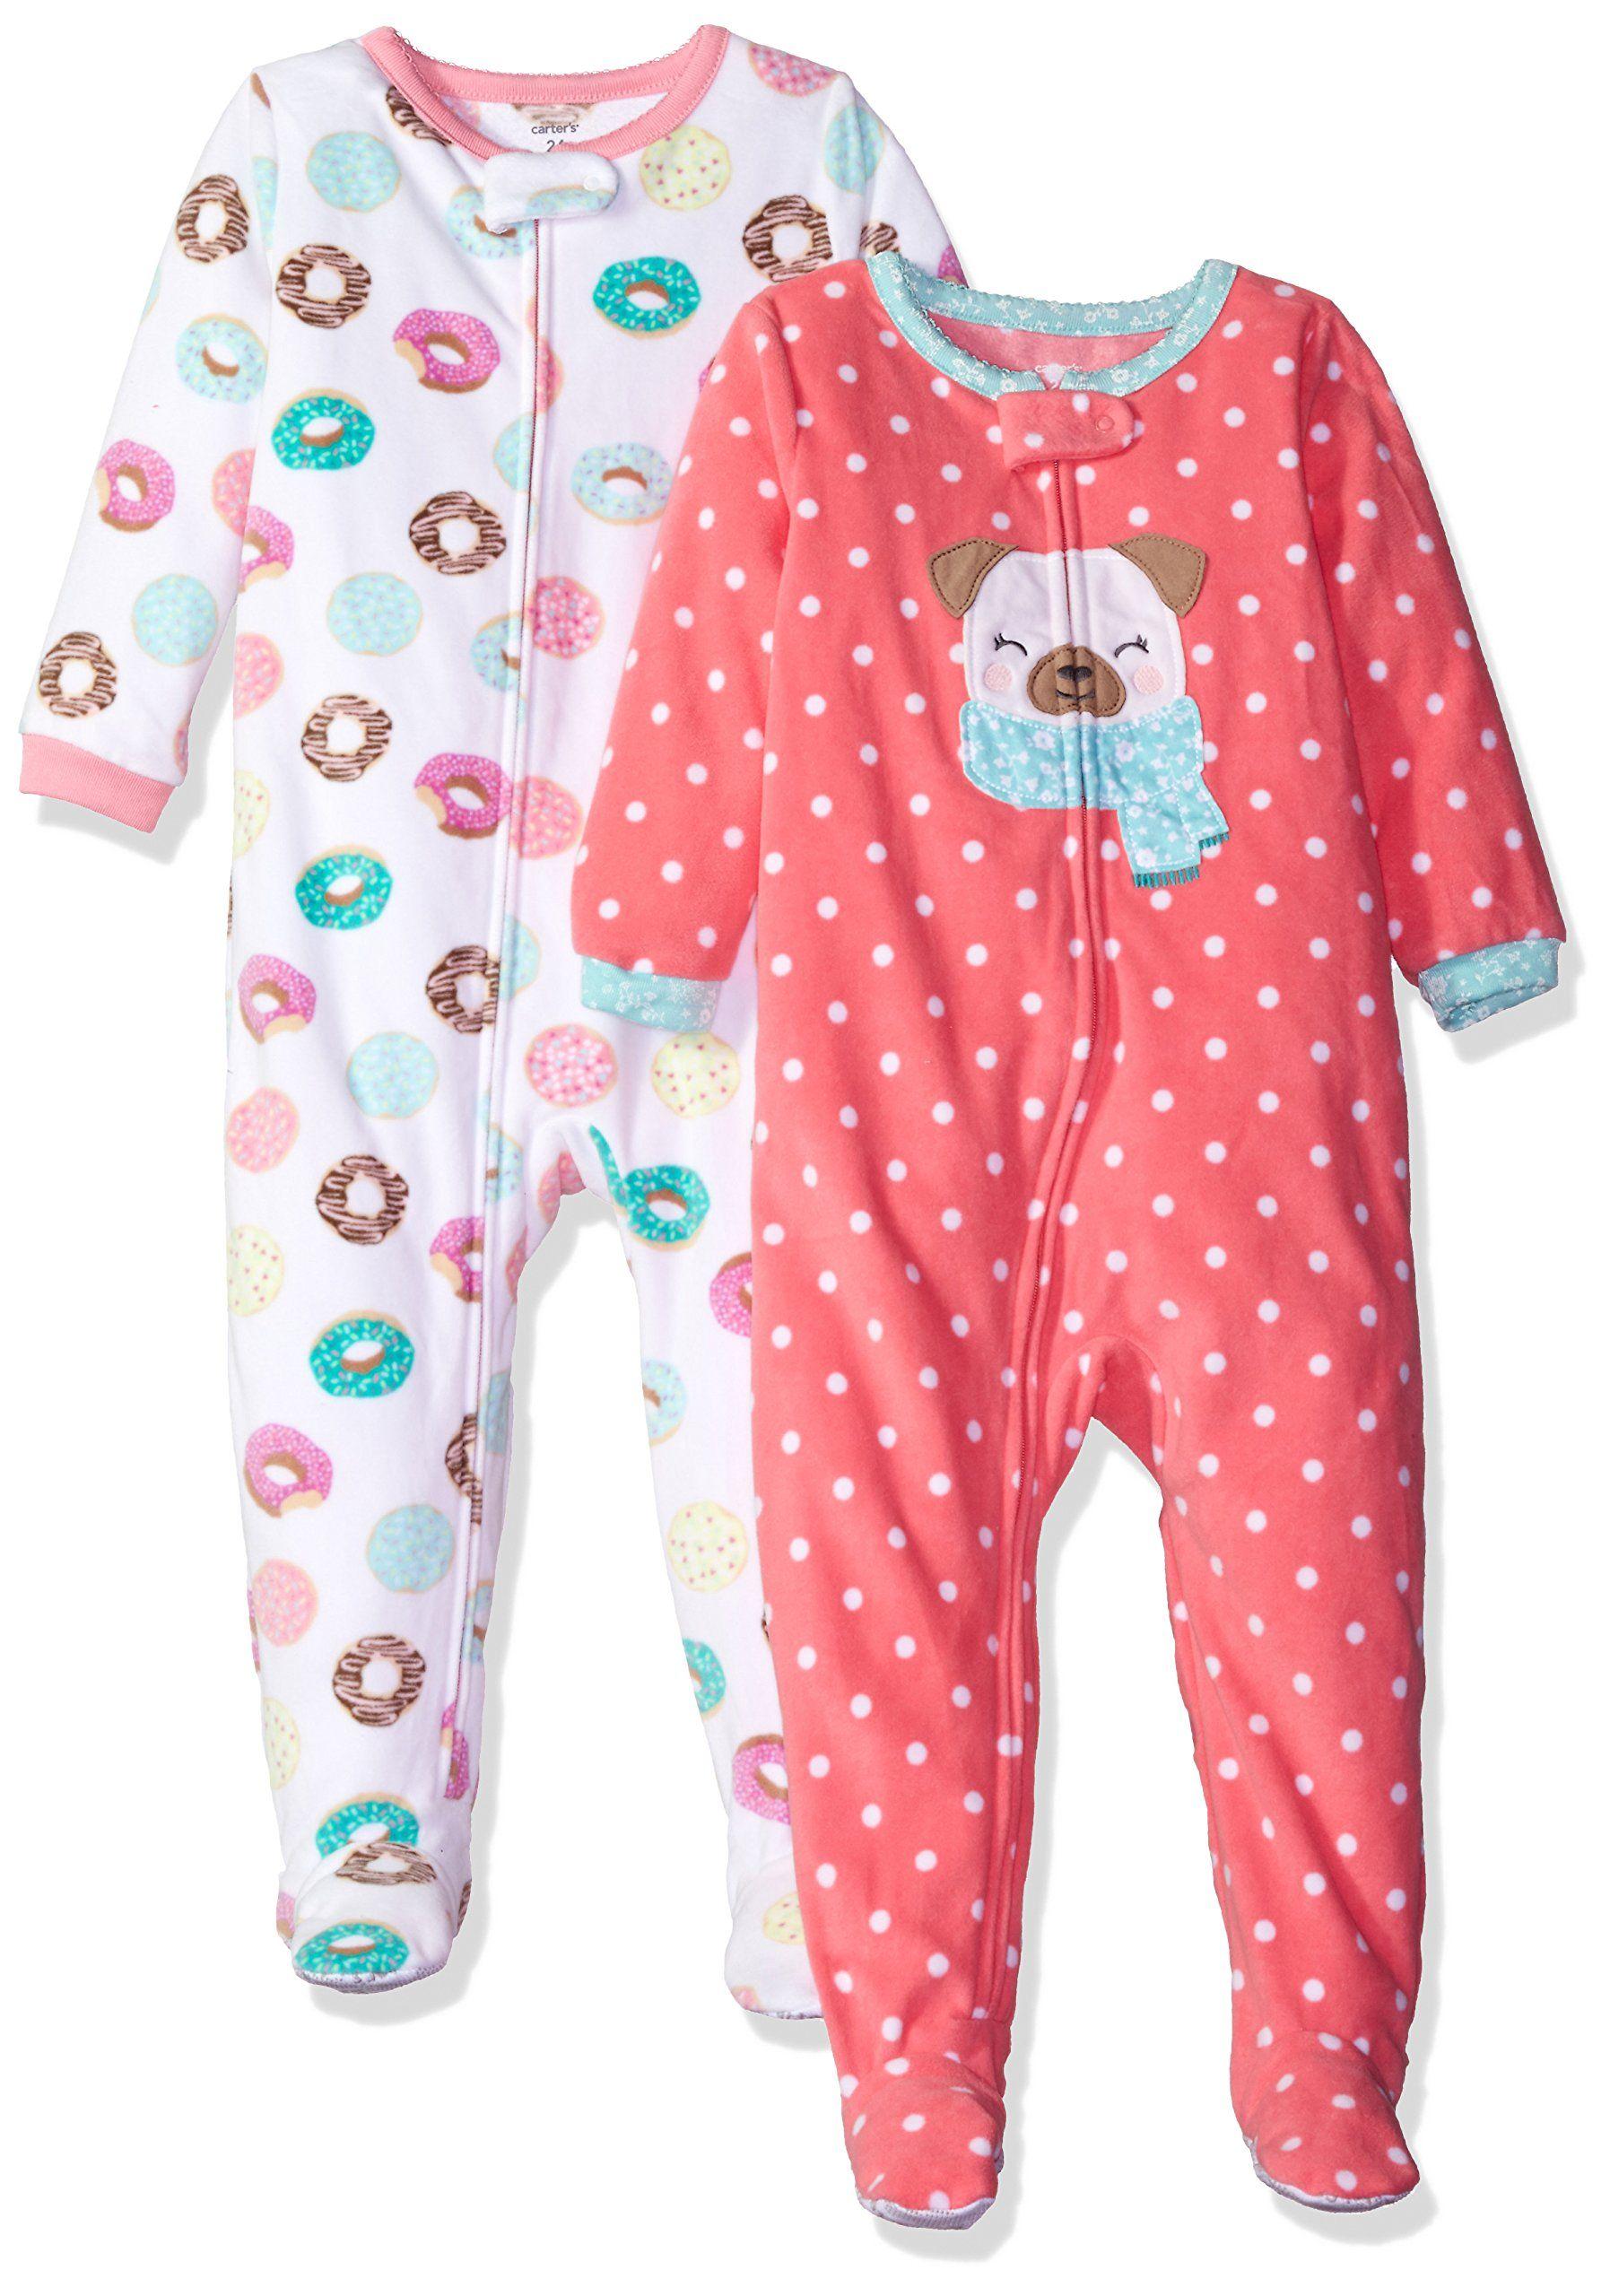 43be85afe Carter s Girls  2-Pack Fleece Pajama Set